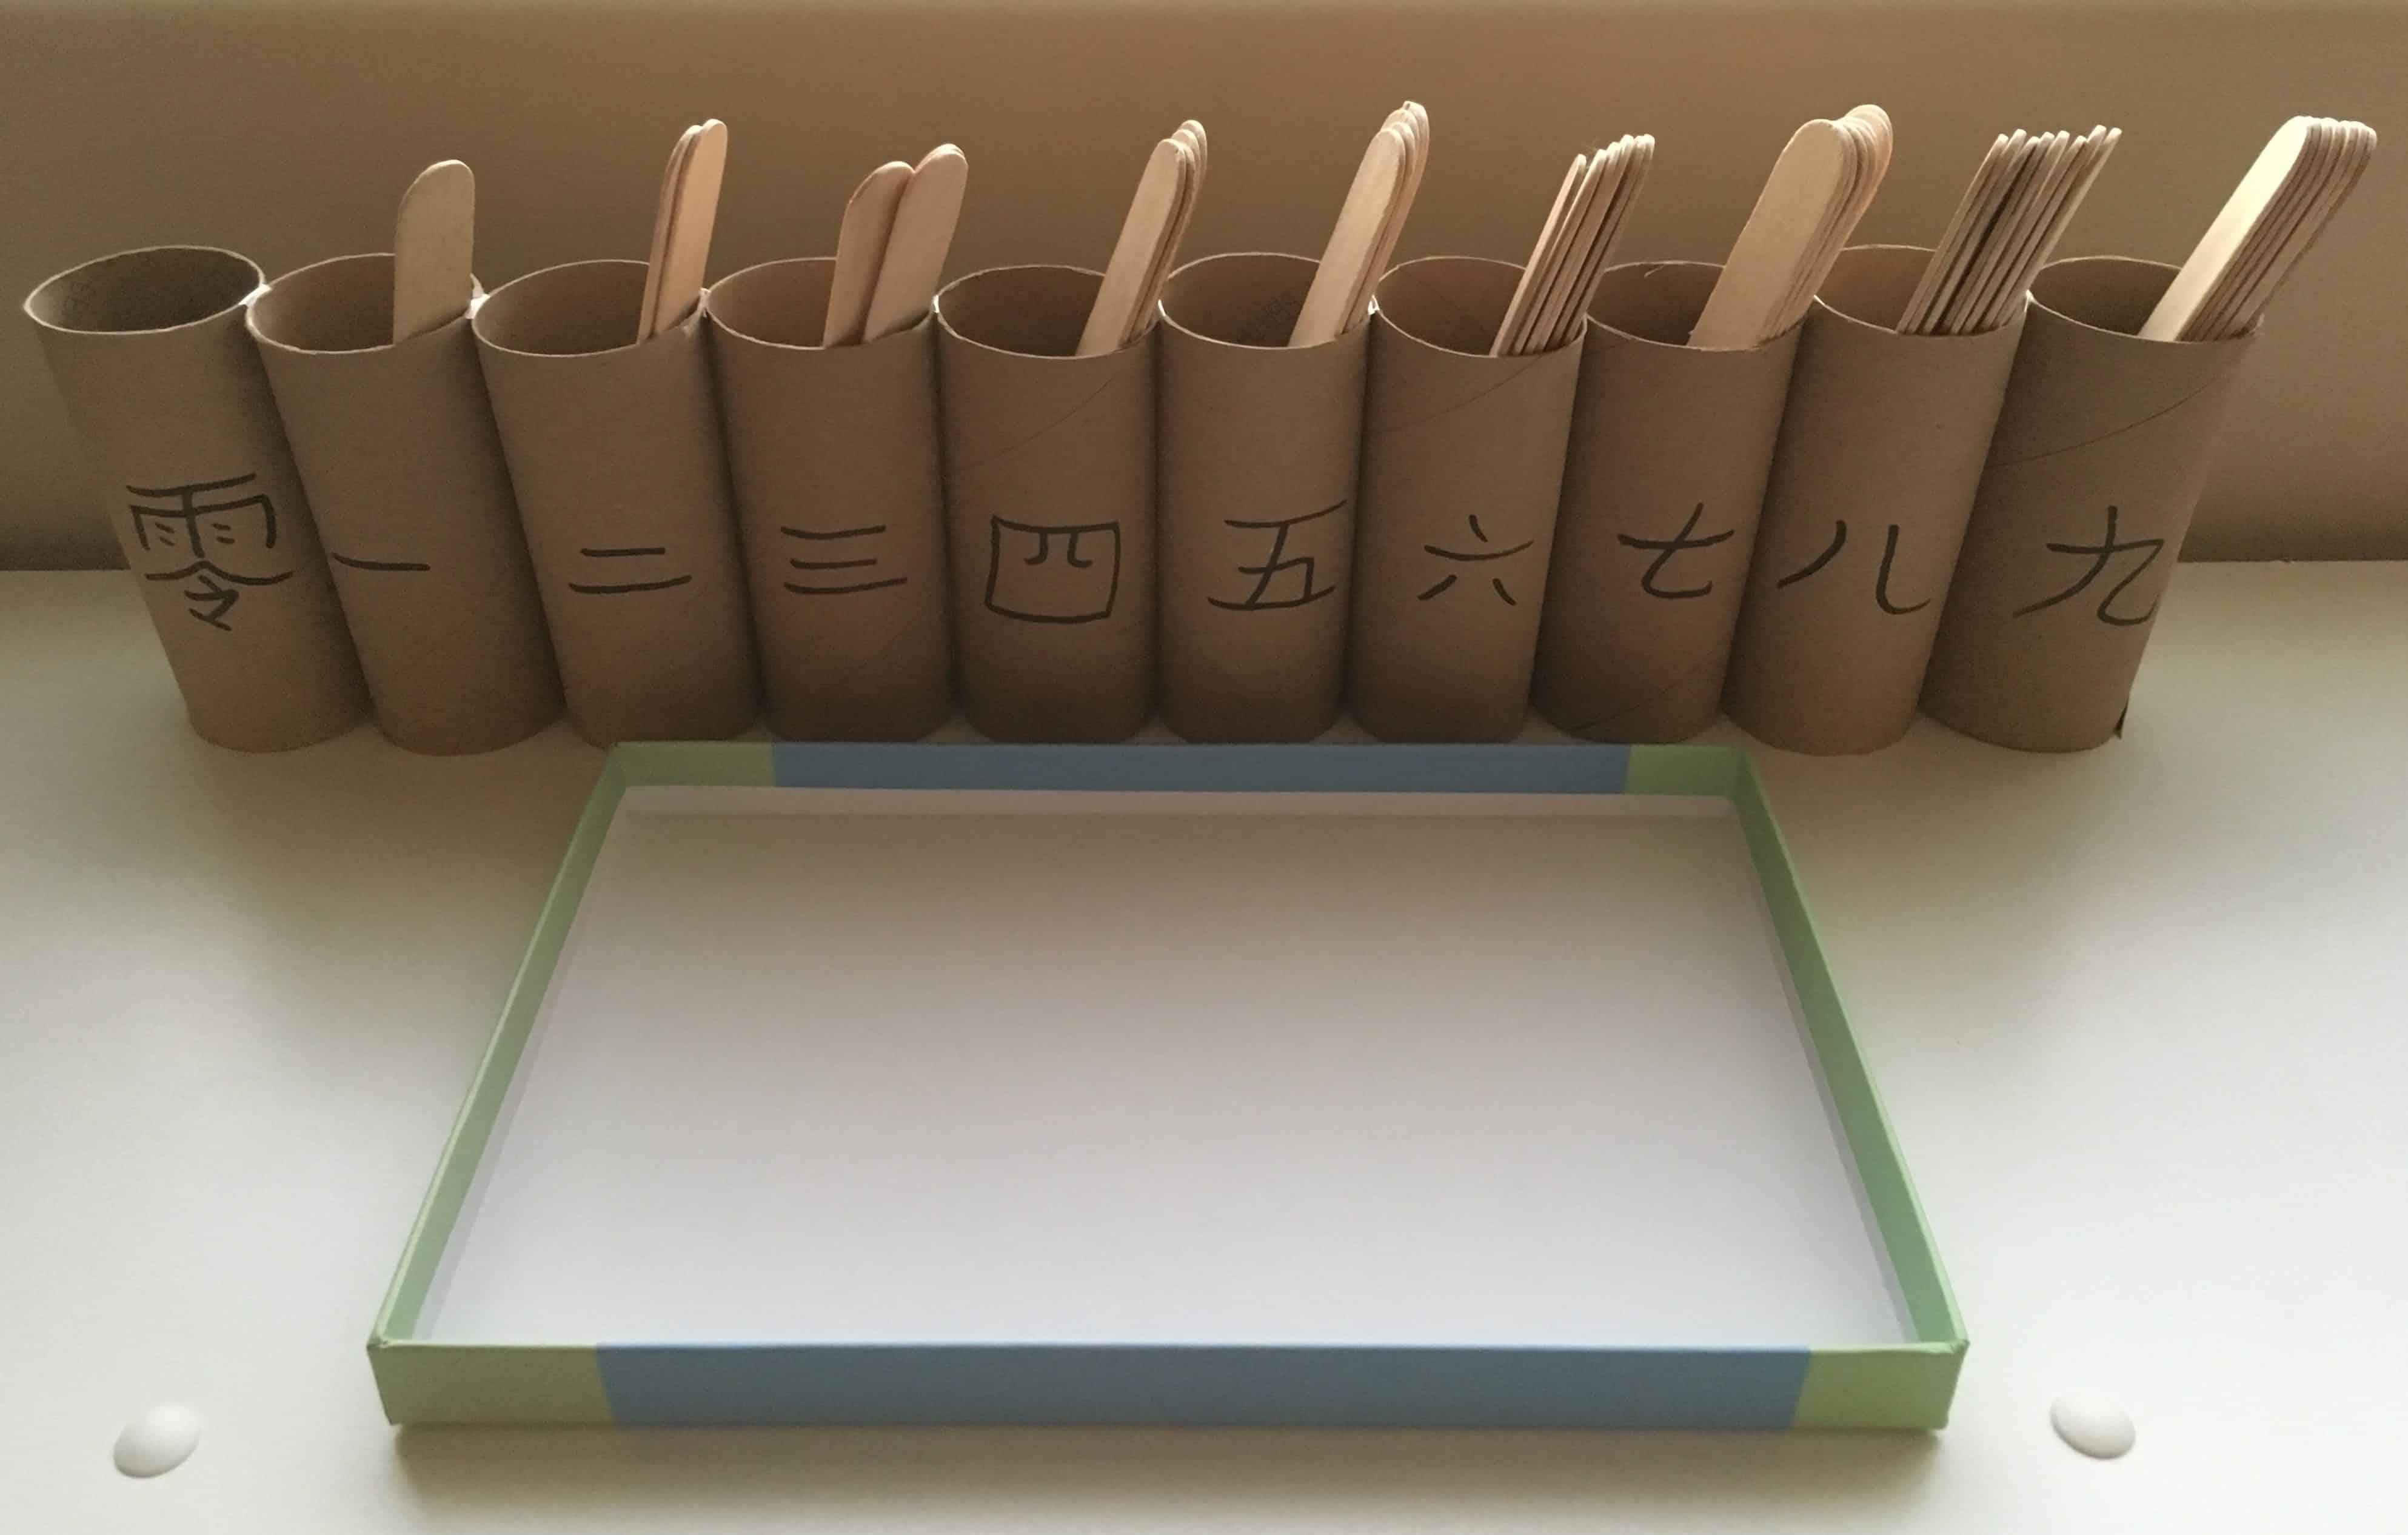 DIY Montessori Spindle with Craft Sticks and Cardboard Rolls